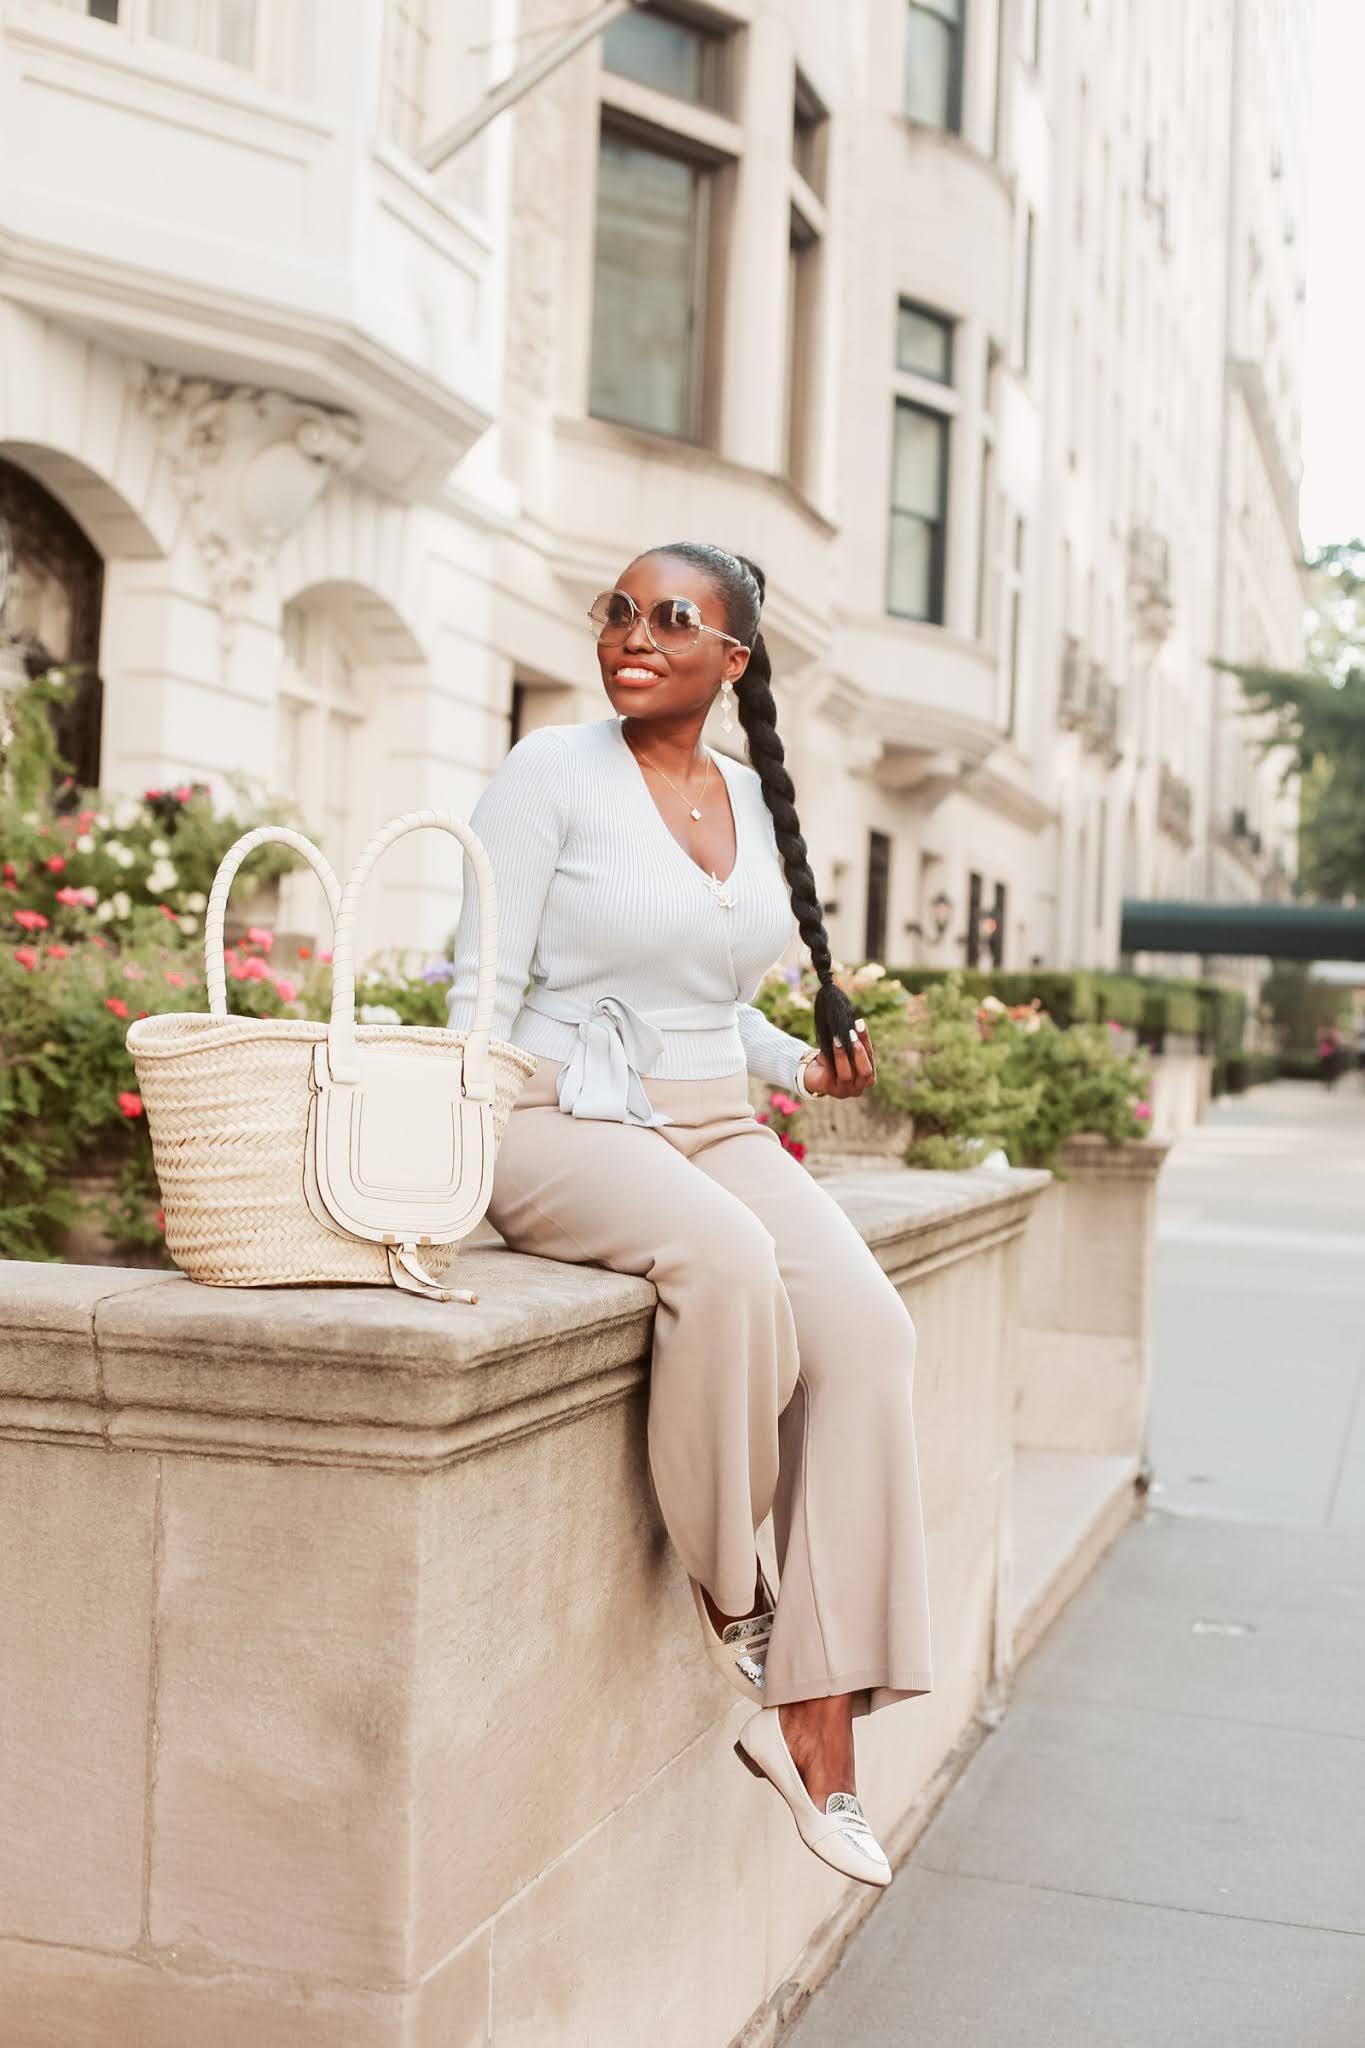 Chic Loungewear from Zara